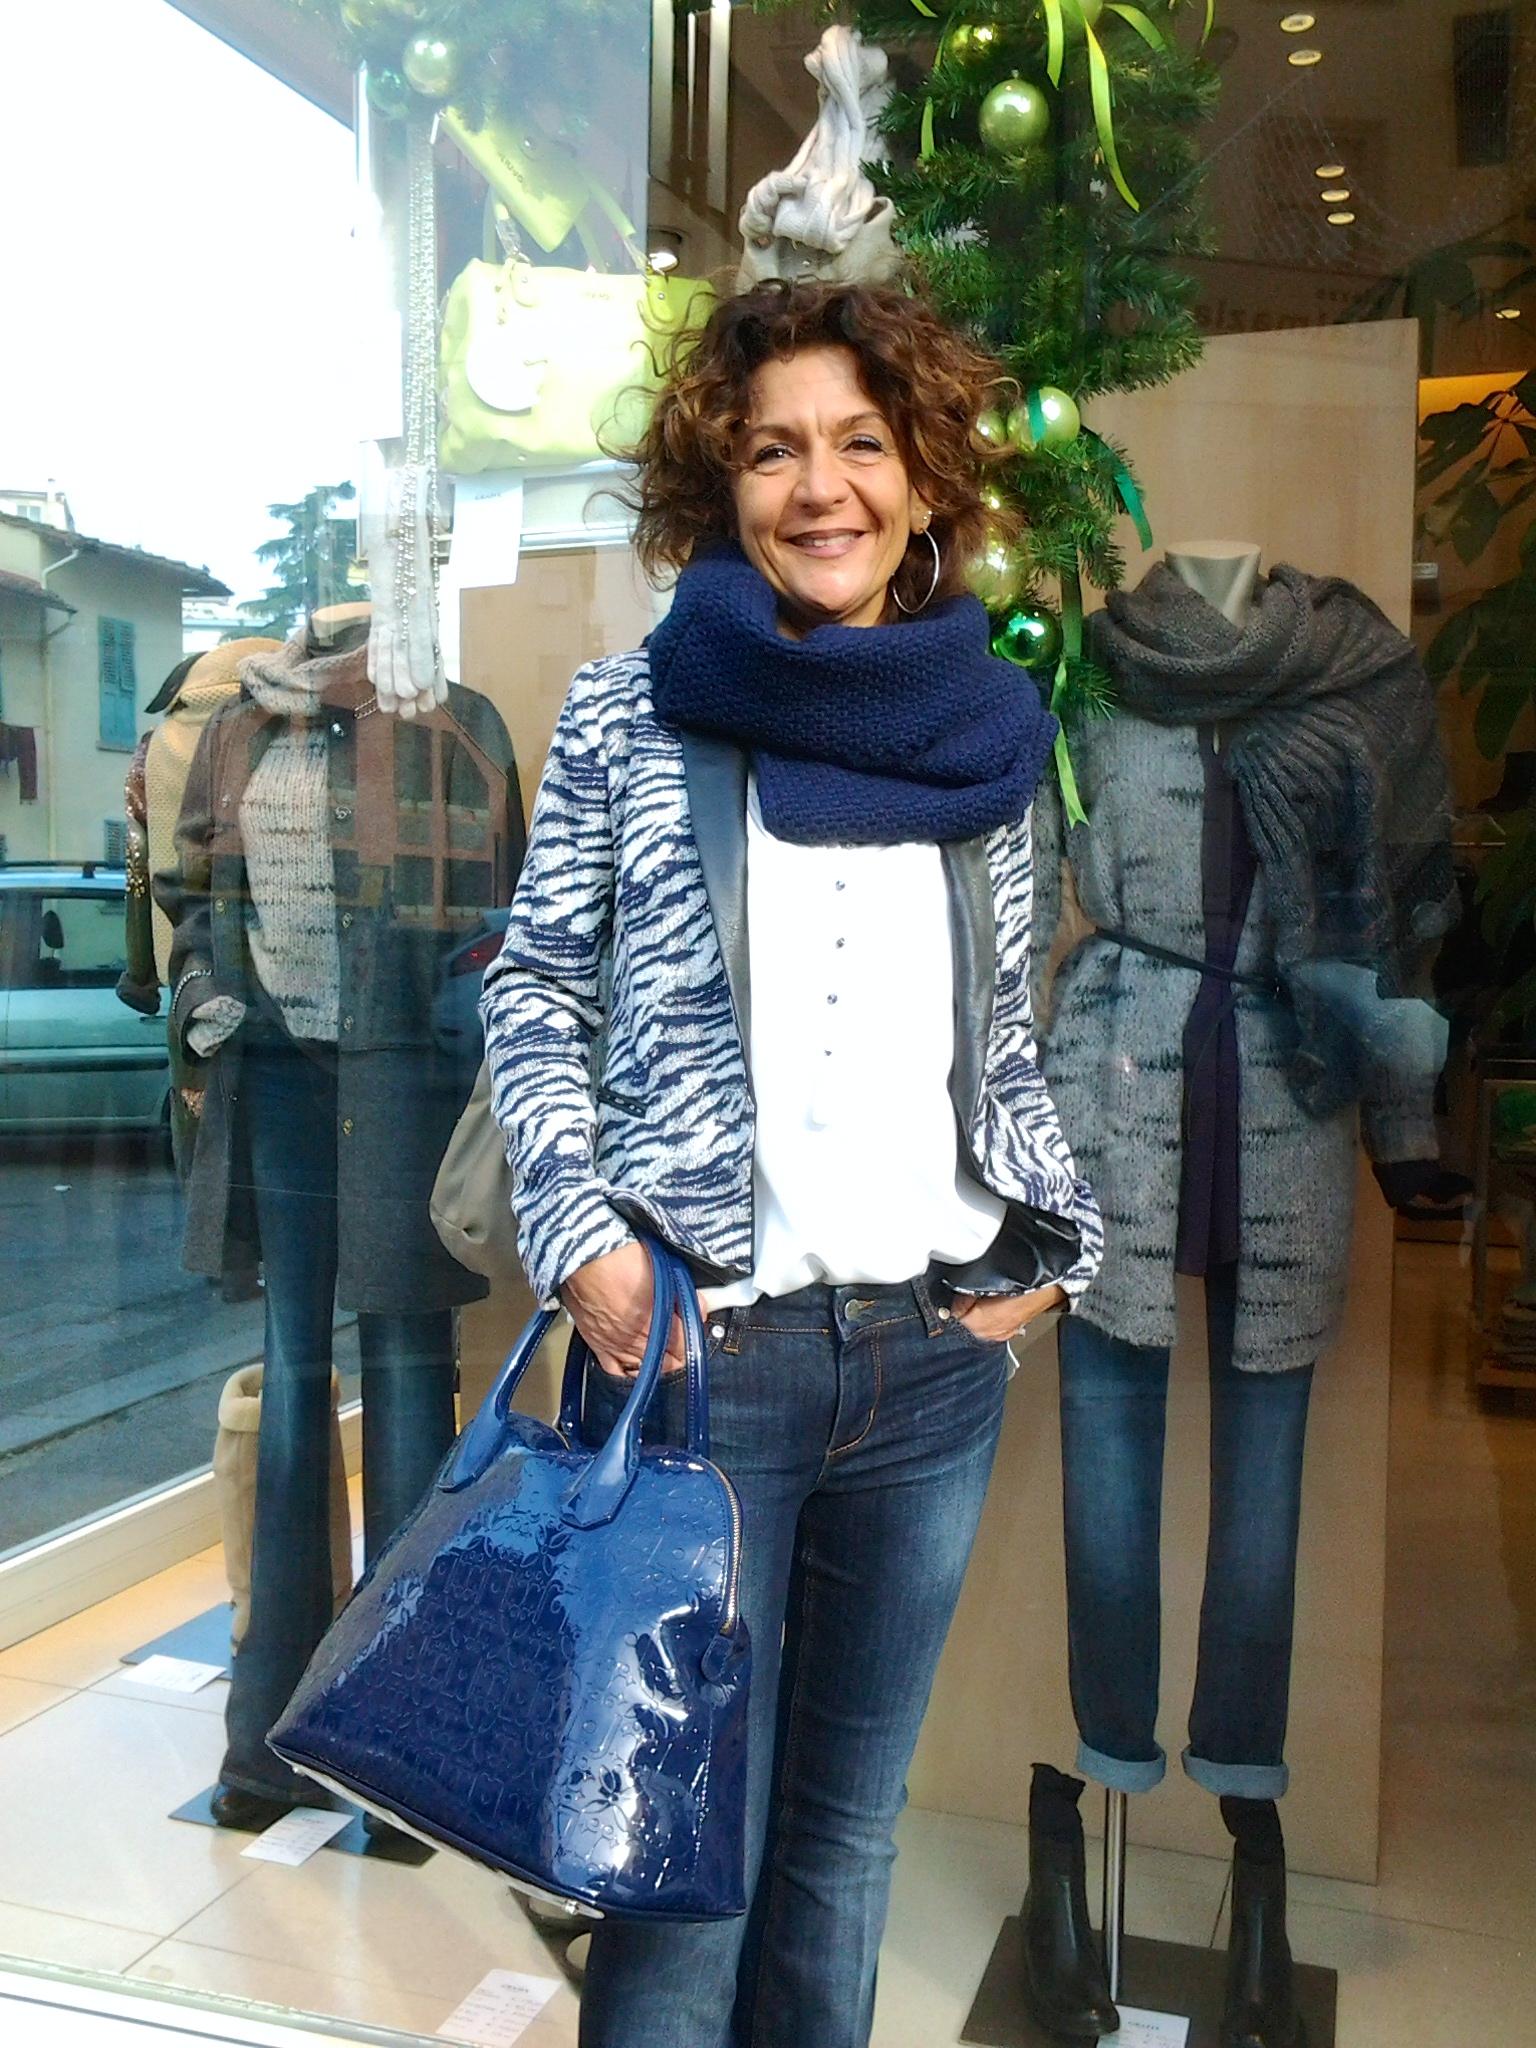 iblues-giacca-animalier-artista-grazia-firenze